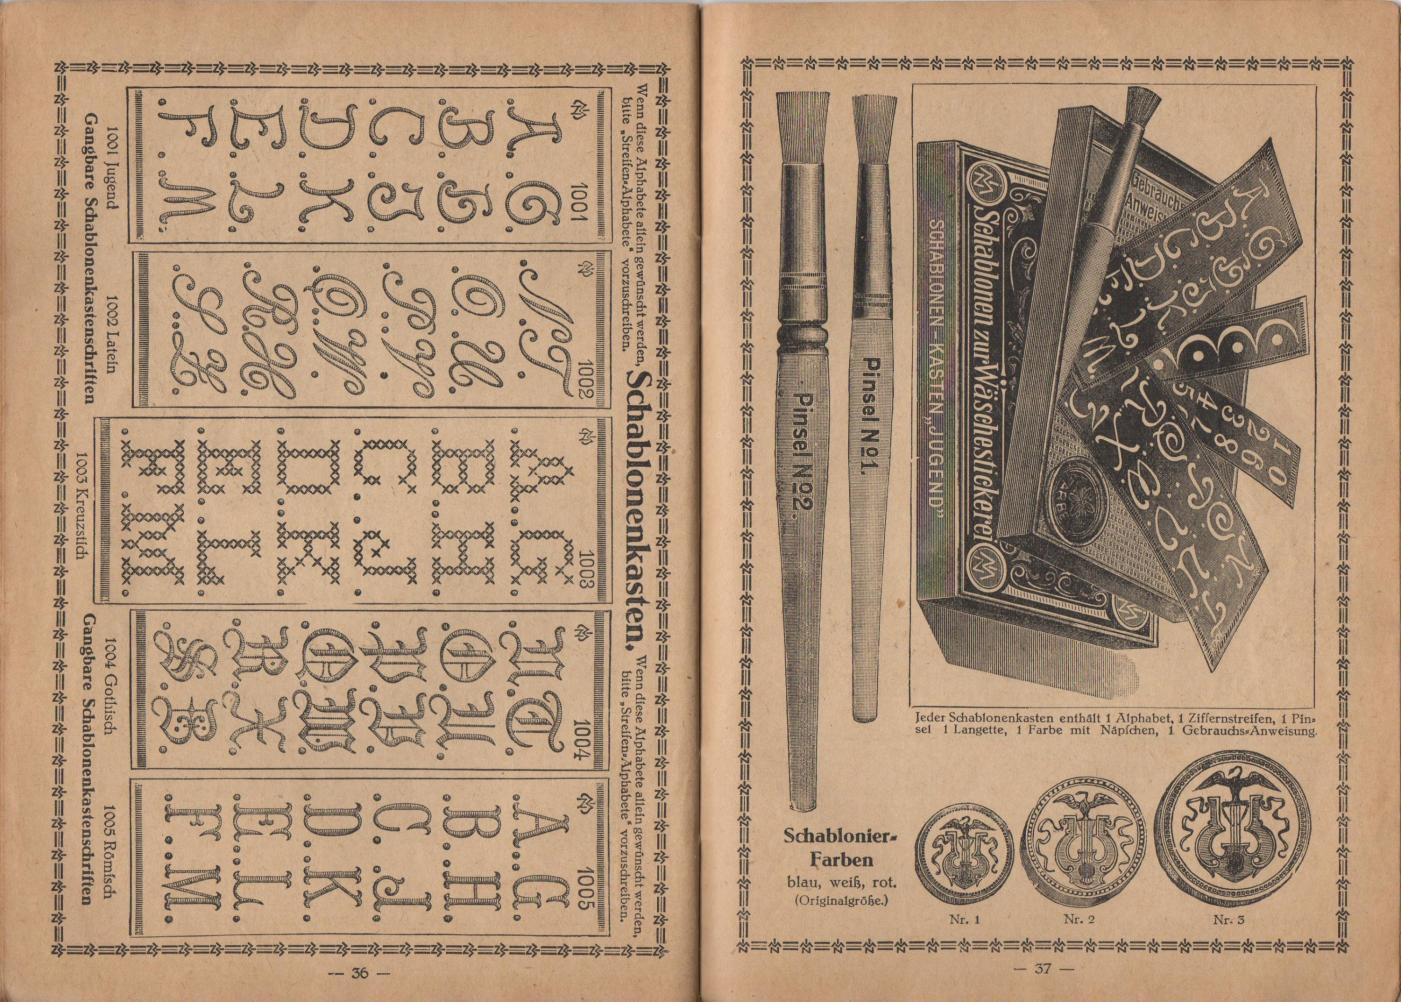 monogramme_36-37.thumb.jpg.e3094a636a11e2f34b627efbe092f654.jpg